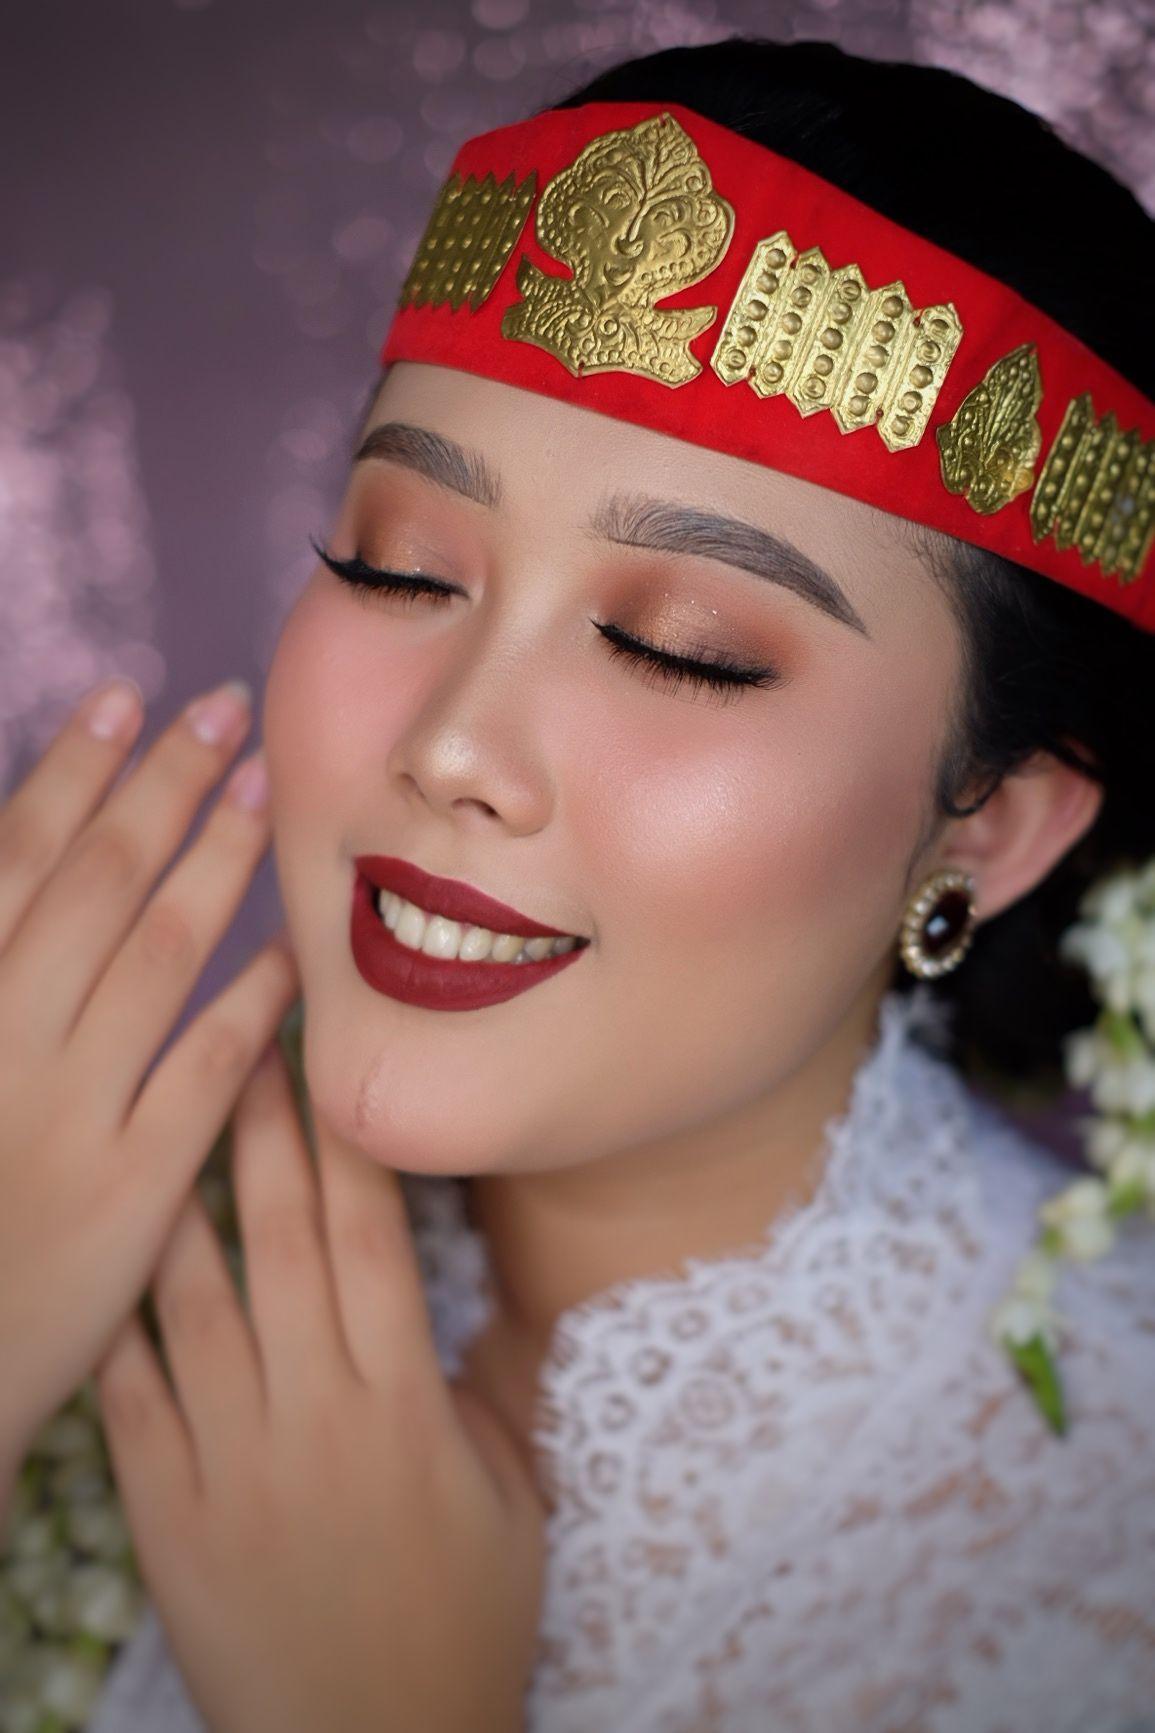 Pengantin Batak Toba Makeup By Meydaasad Indonesianwedding Indonesianart Indonesia Batak Bataknese Sortali Pengantin Makeup Pengantin Make Up